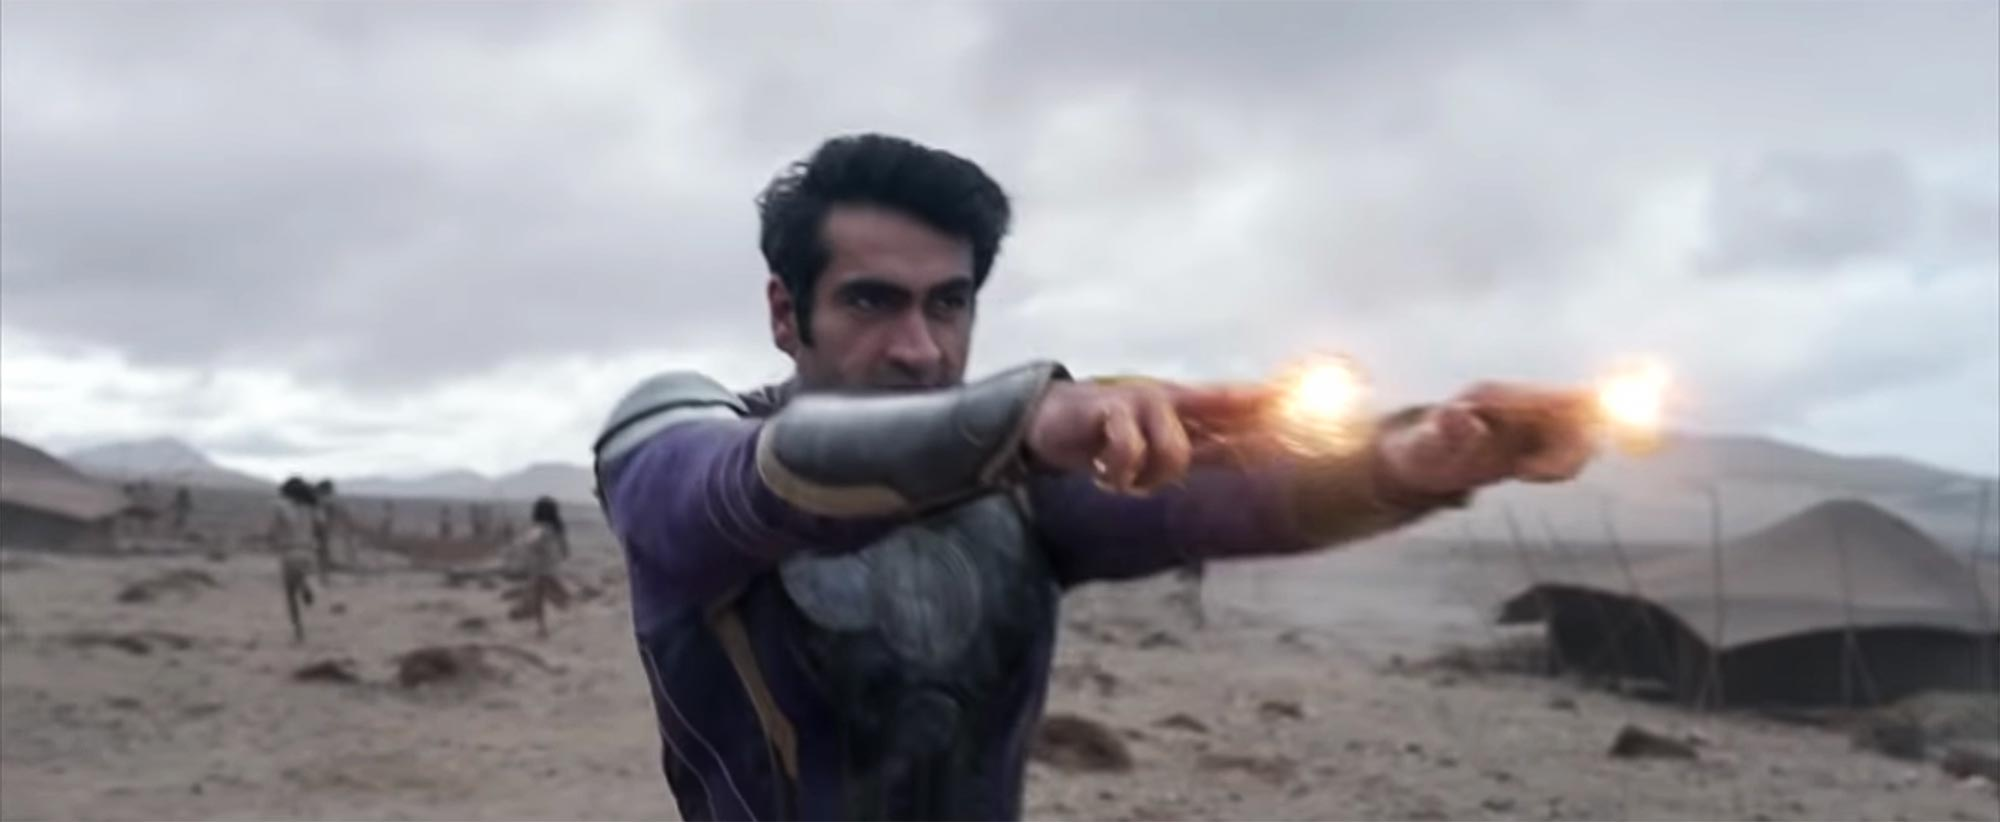 Kumail Nanjiani on Marvel Studios' Eternals